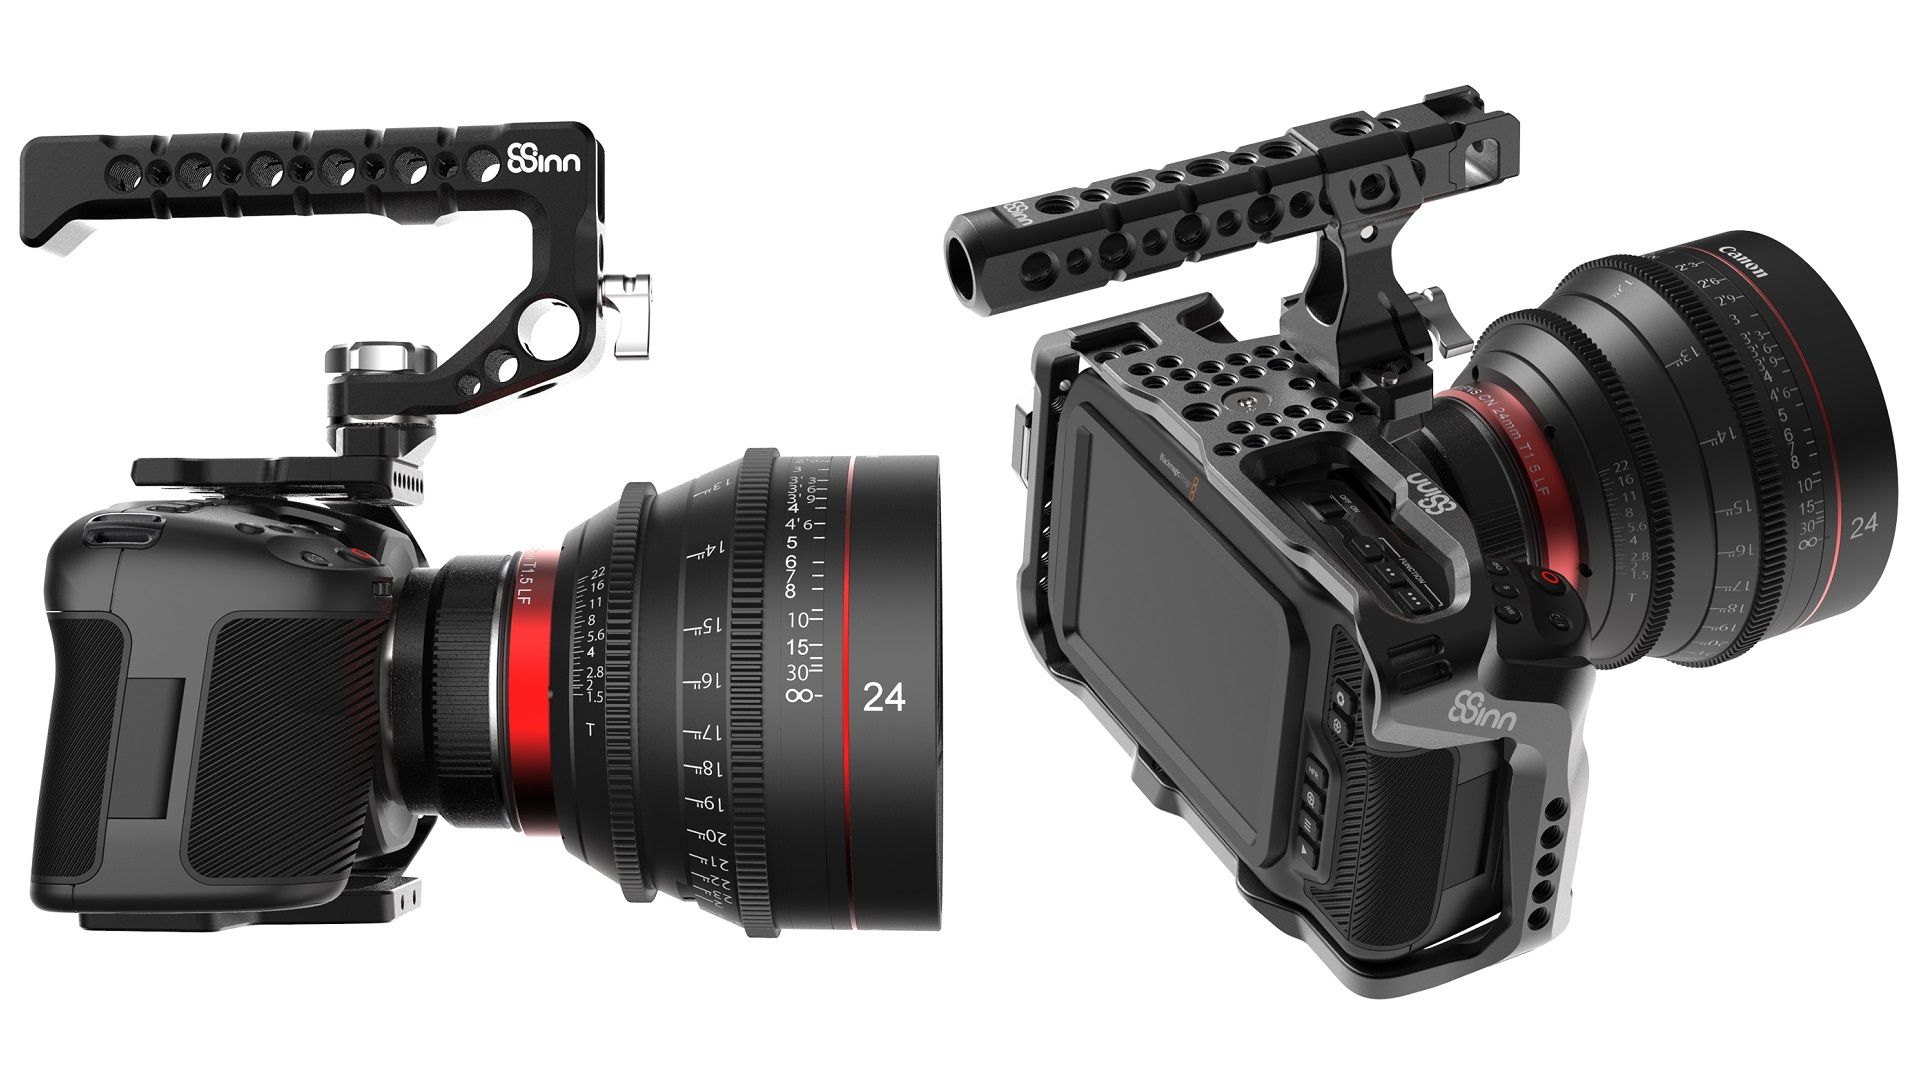 8Sinn Presenta el Primer Armazón Para Cámaras BlackMagic Pocket Cinema 4K